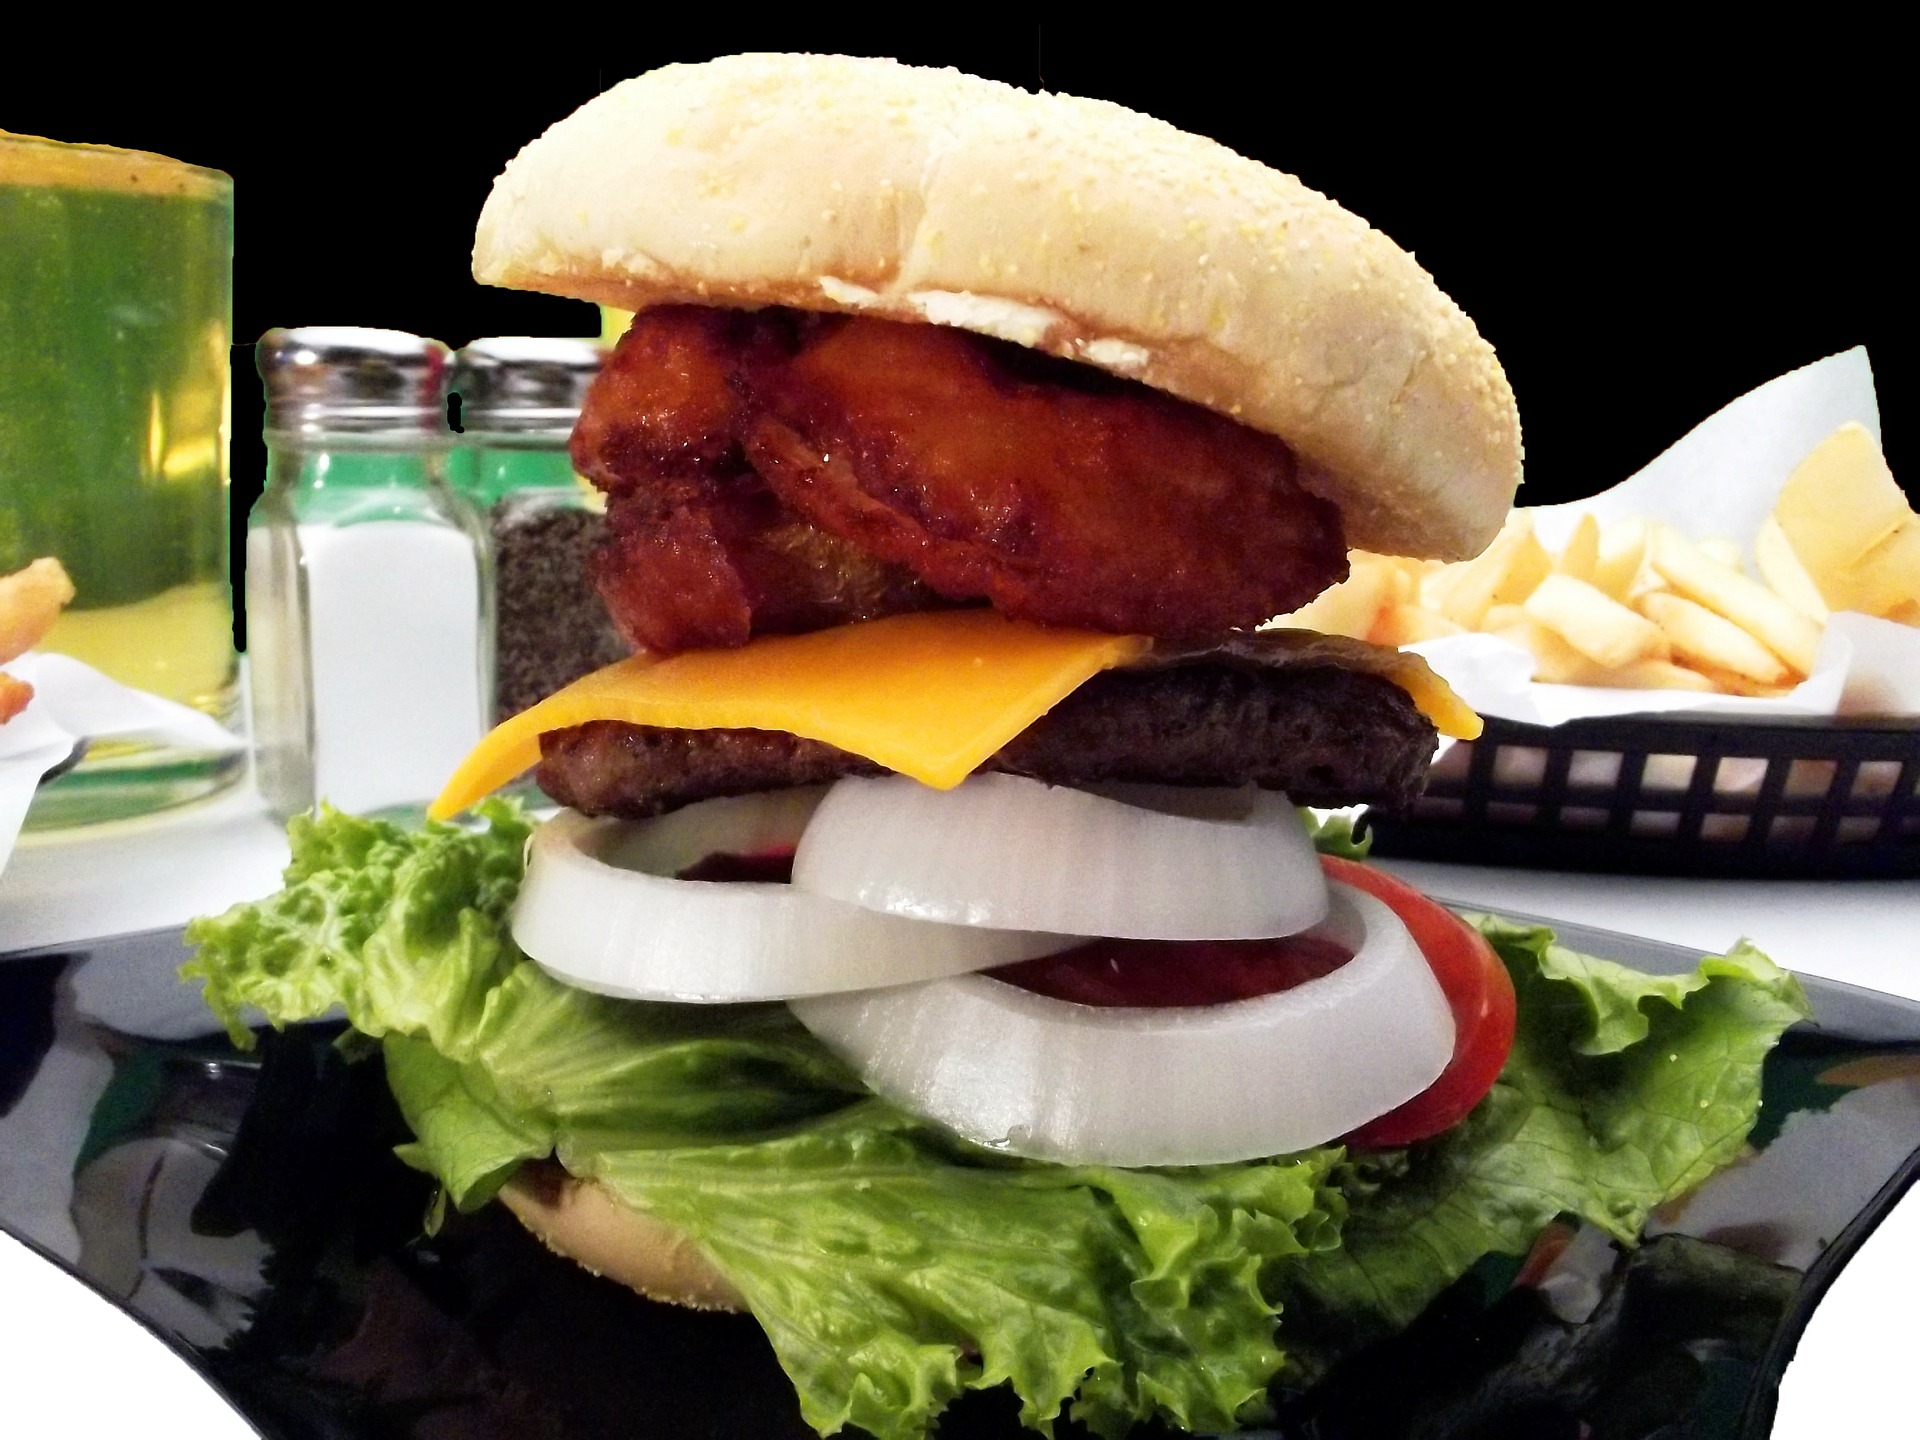 Heart Disease Linked To Fast Food